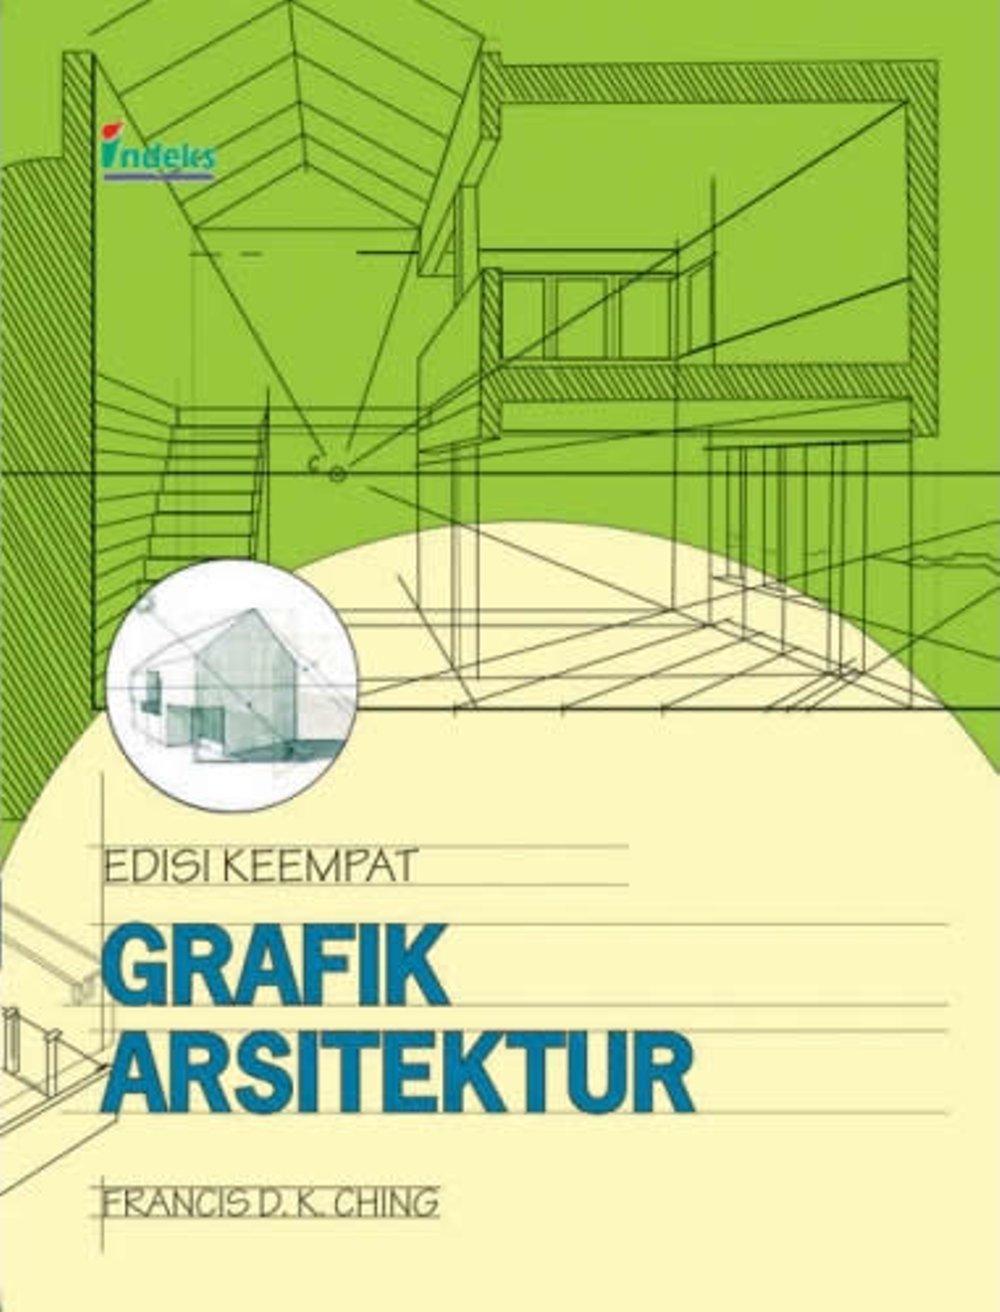 Grafik Arsitektur Edisi4